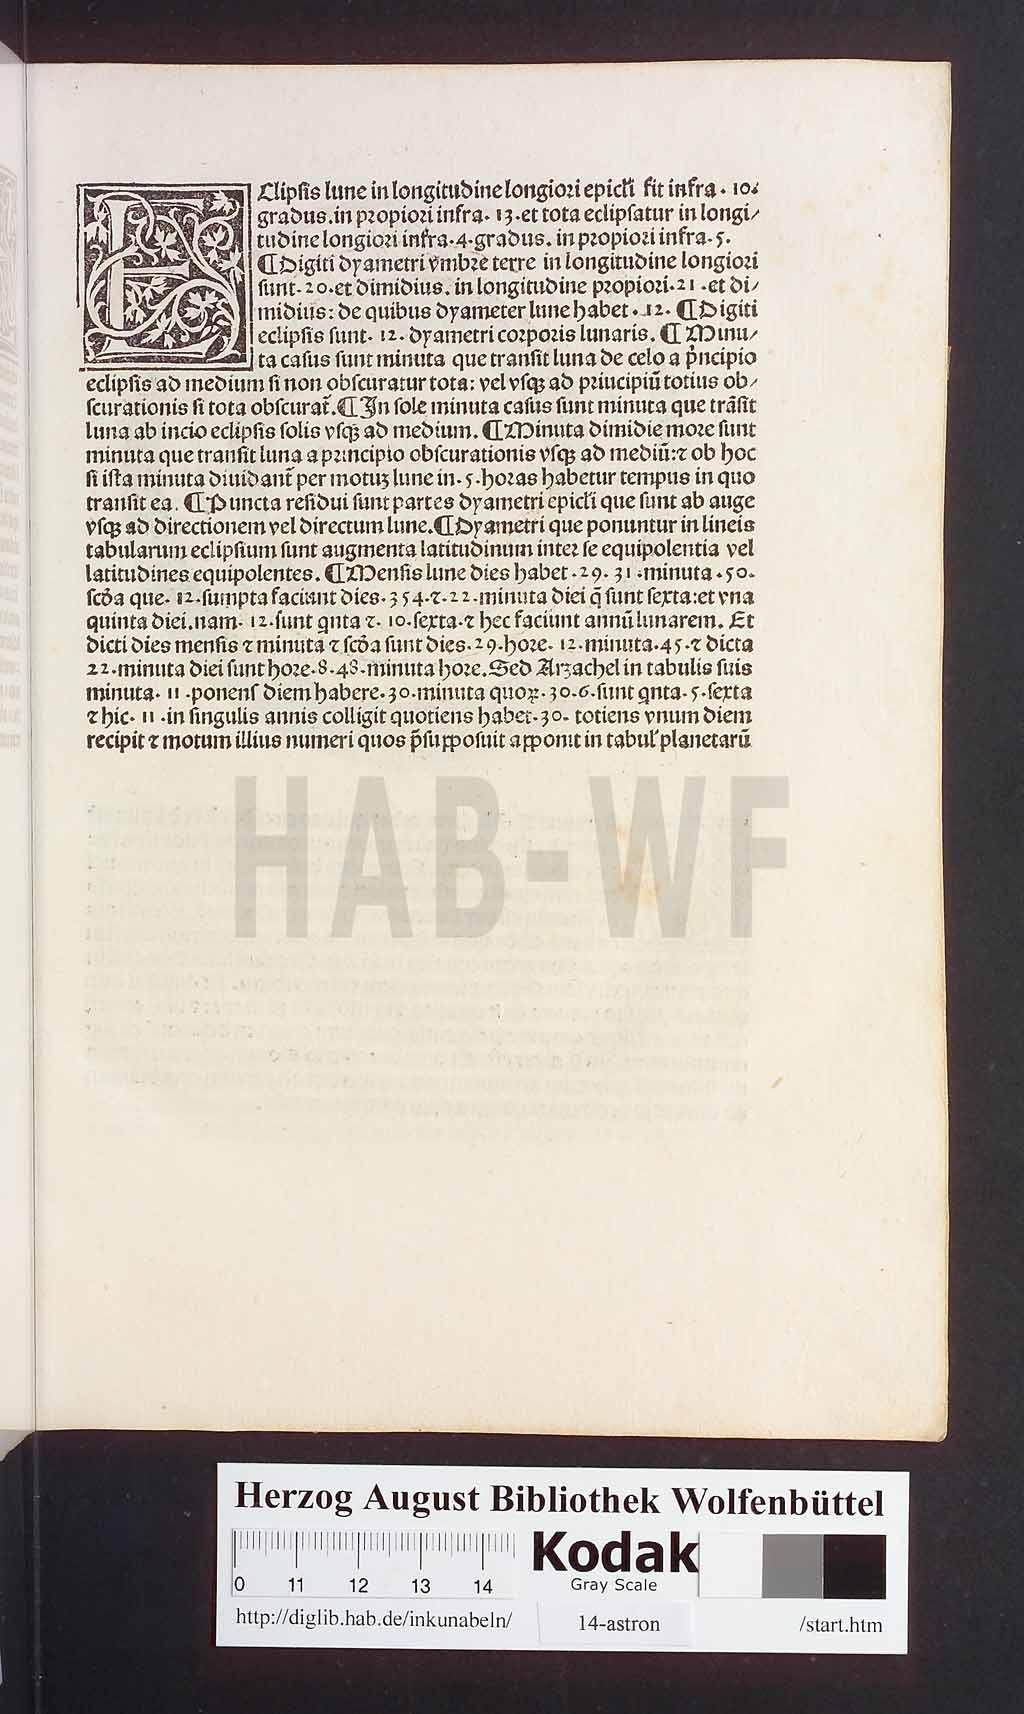 http://diglib.hab.de/inkunabeln/14-astron/00031.jpg